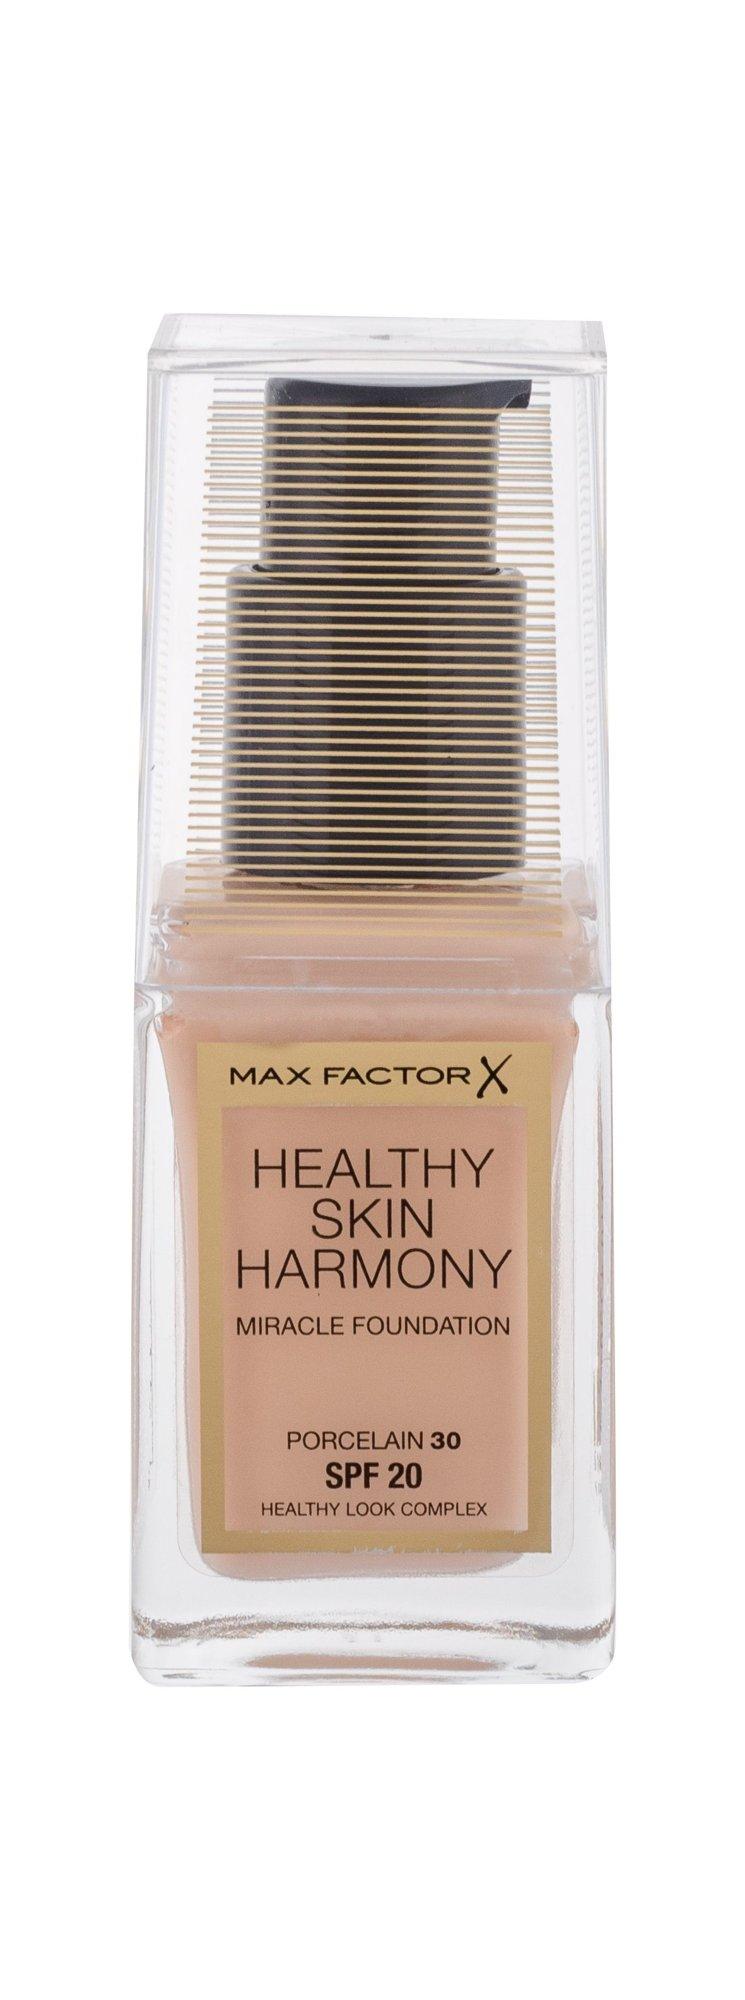 Max Factor Healthy Skin Harmony Makeup 30ml 30 Porcelain